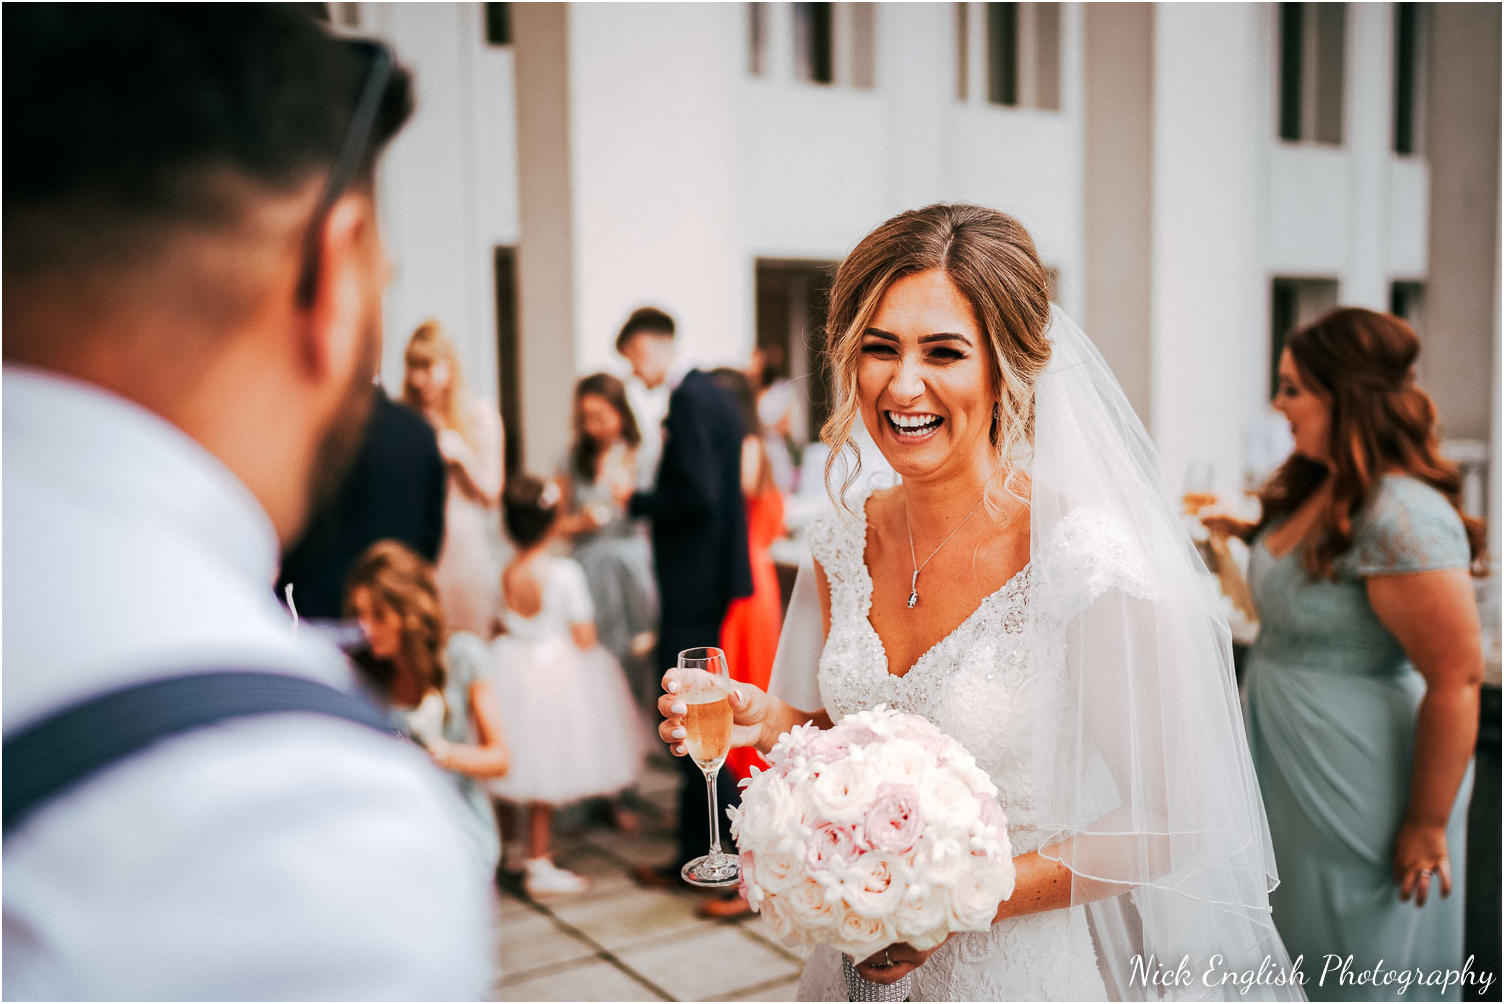 Destination_Wedding_Photographer_Slovenia_Nick_English_Photography-61.jpg